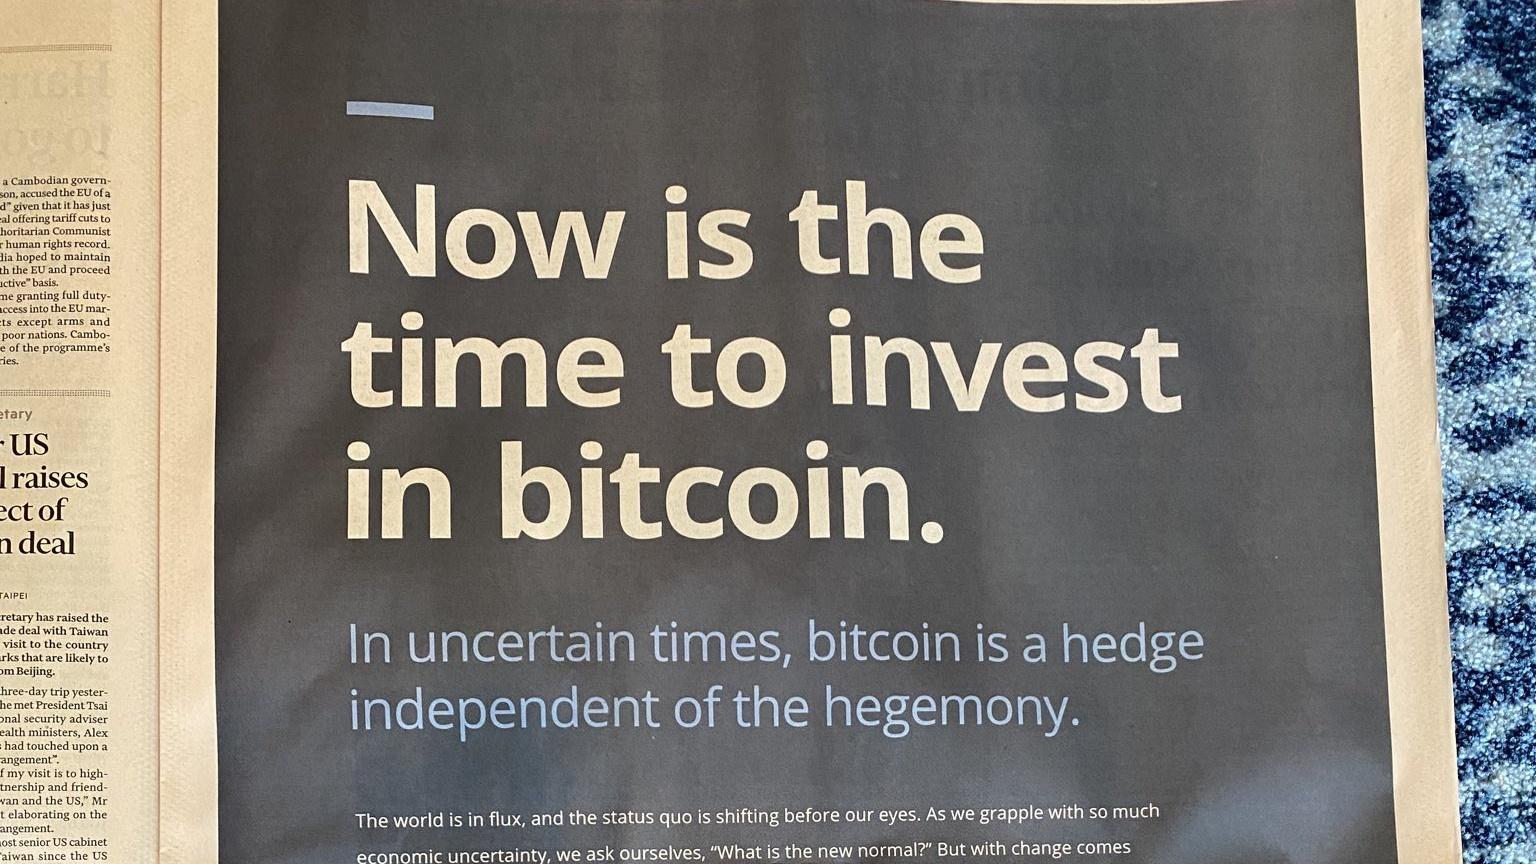 Buy Bitcoin, screams Galaxy's huge ad in the Financial Times - Decrypt